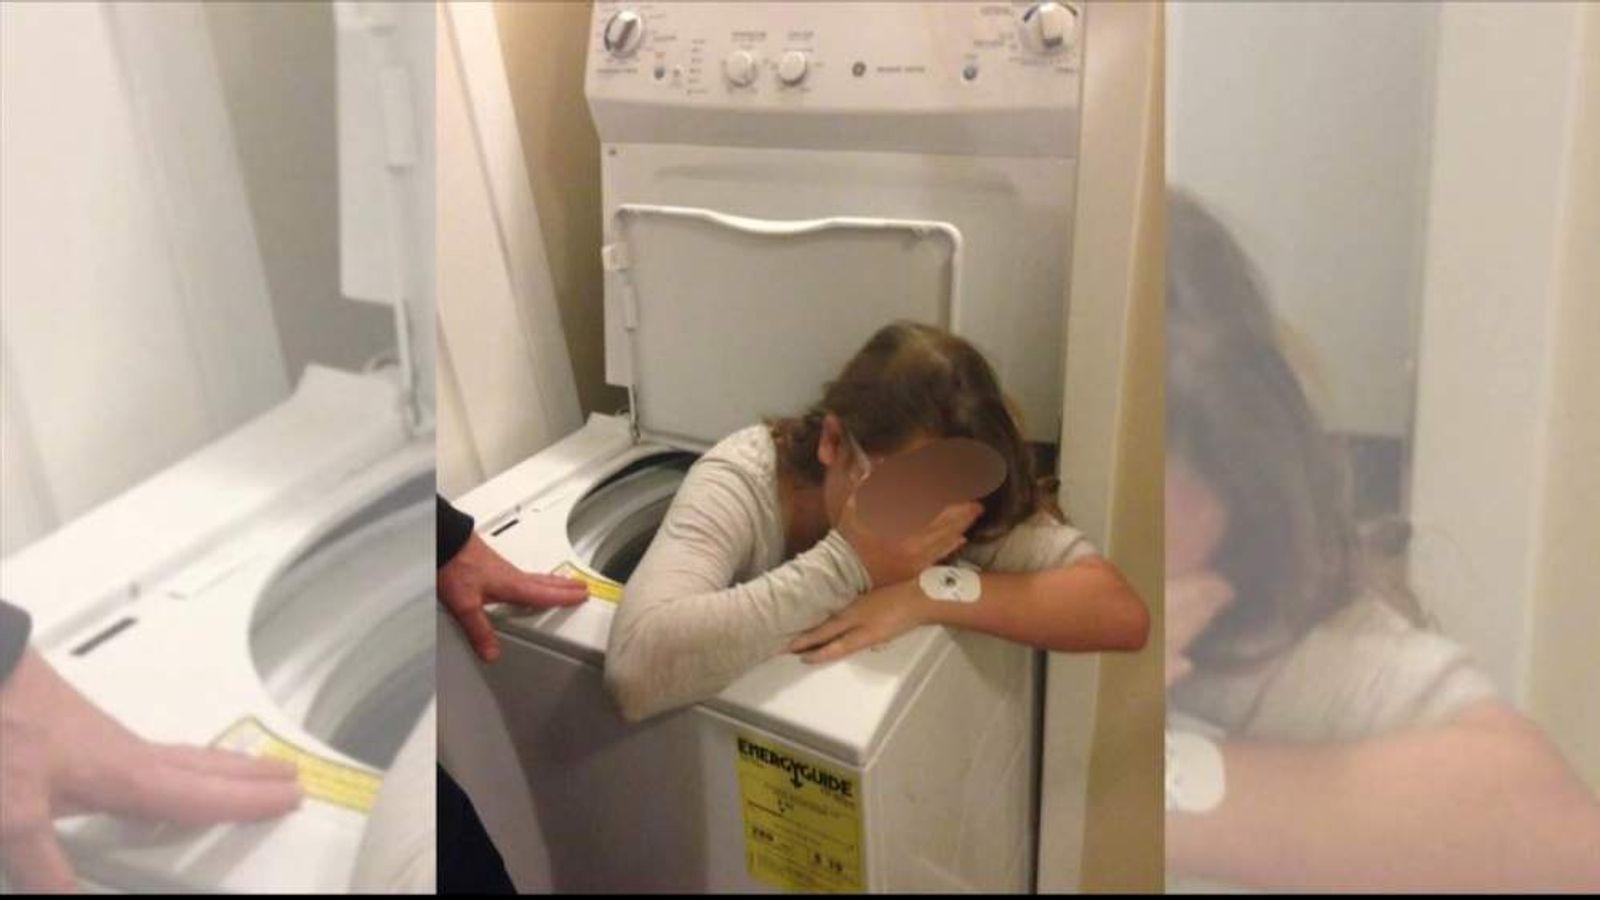 Trinity while stuck in the washing machine